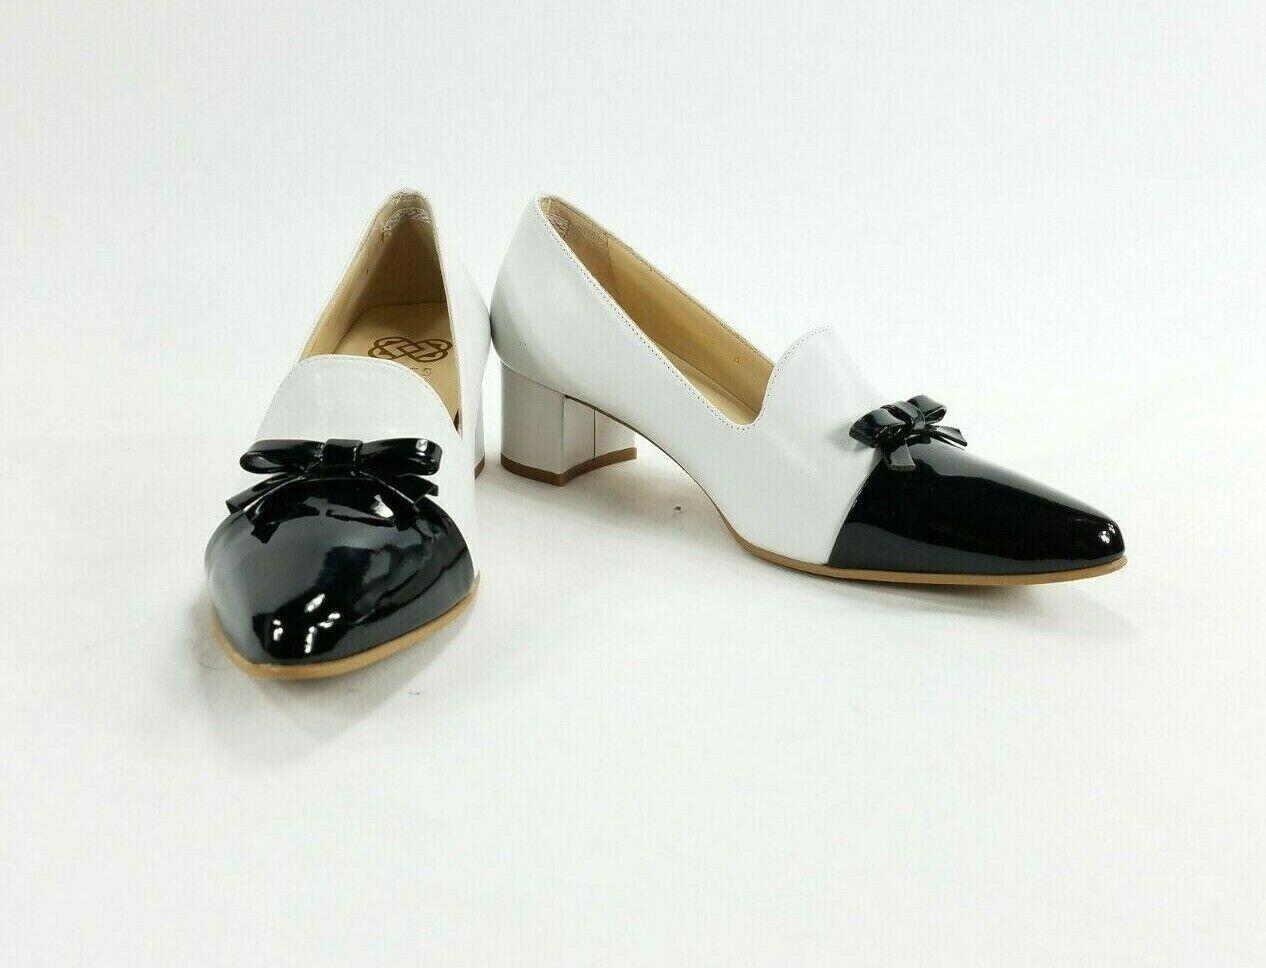 Ukies Paloma Womens Two-Toned Heels Slip On shoes Sz 6M